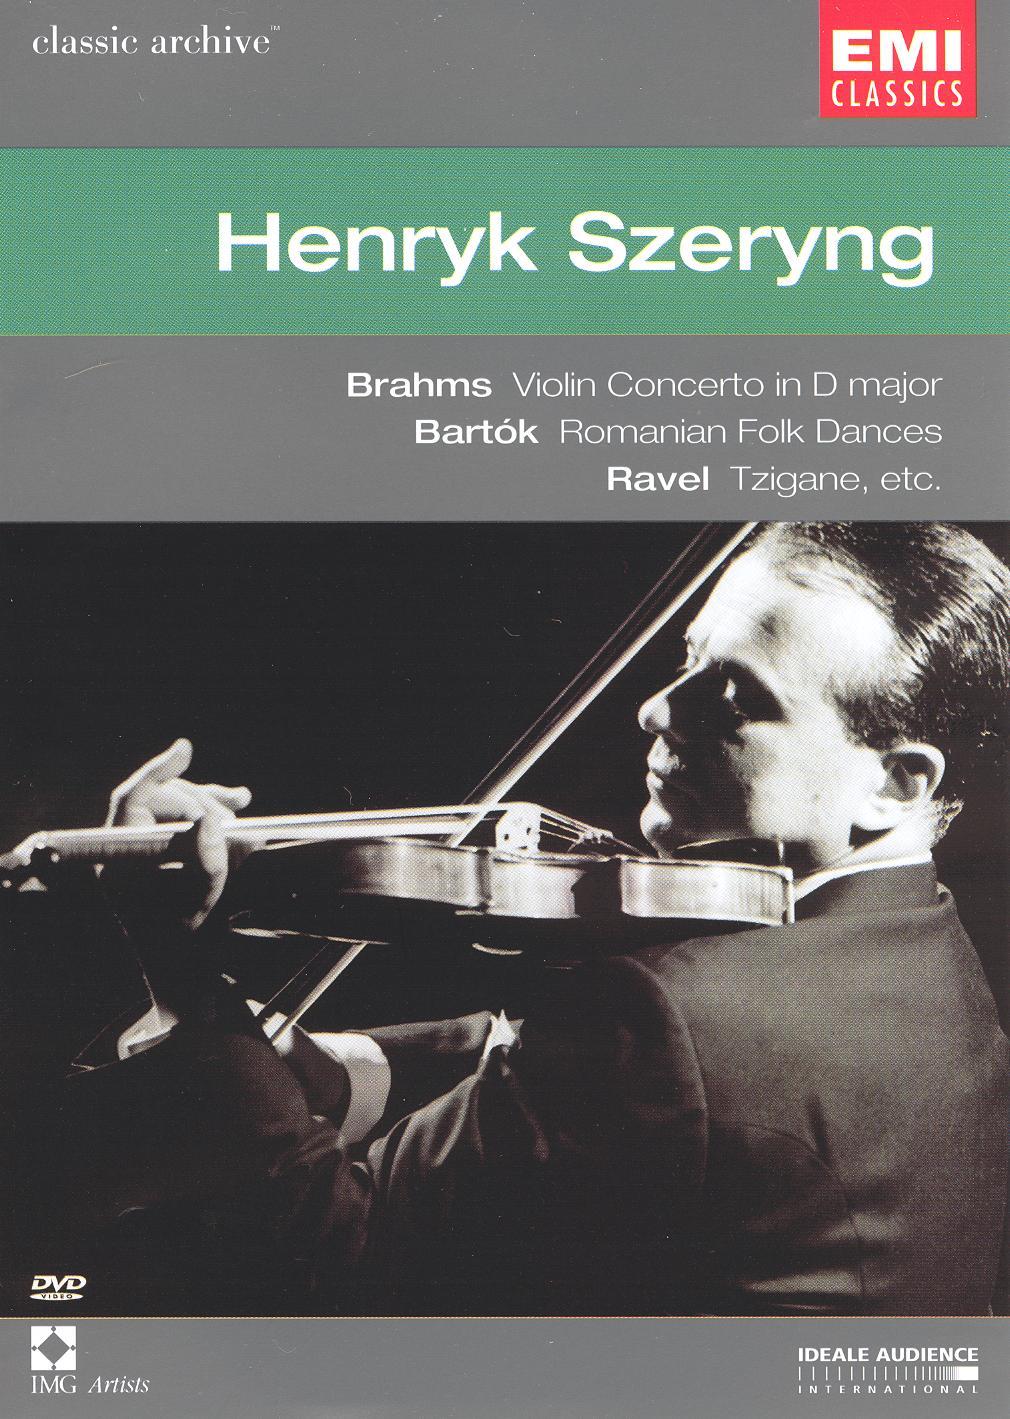 Classics Archive: Henryk Szeryng - Brahms, Bartok, Ravel